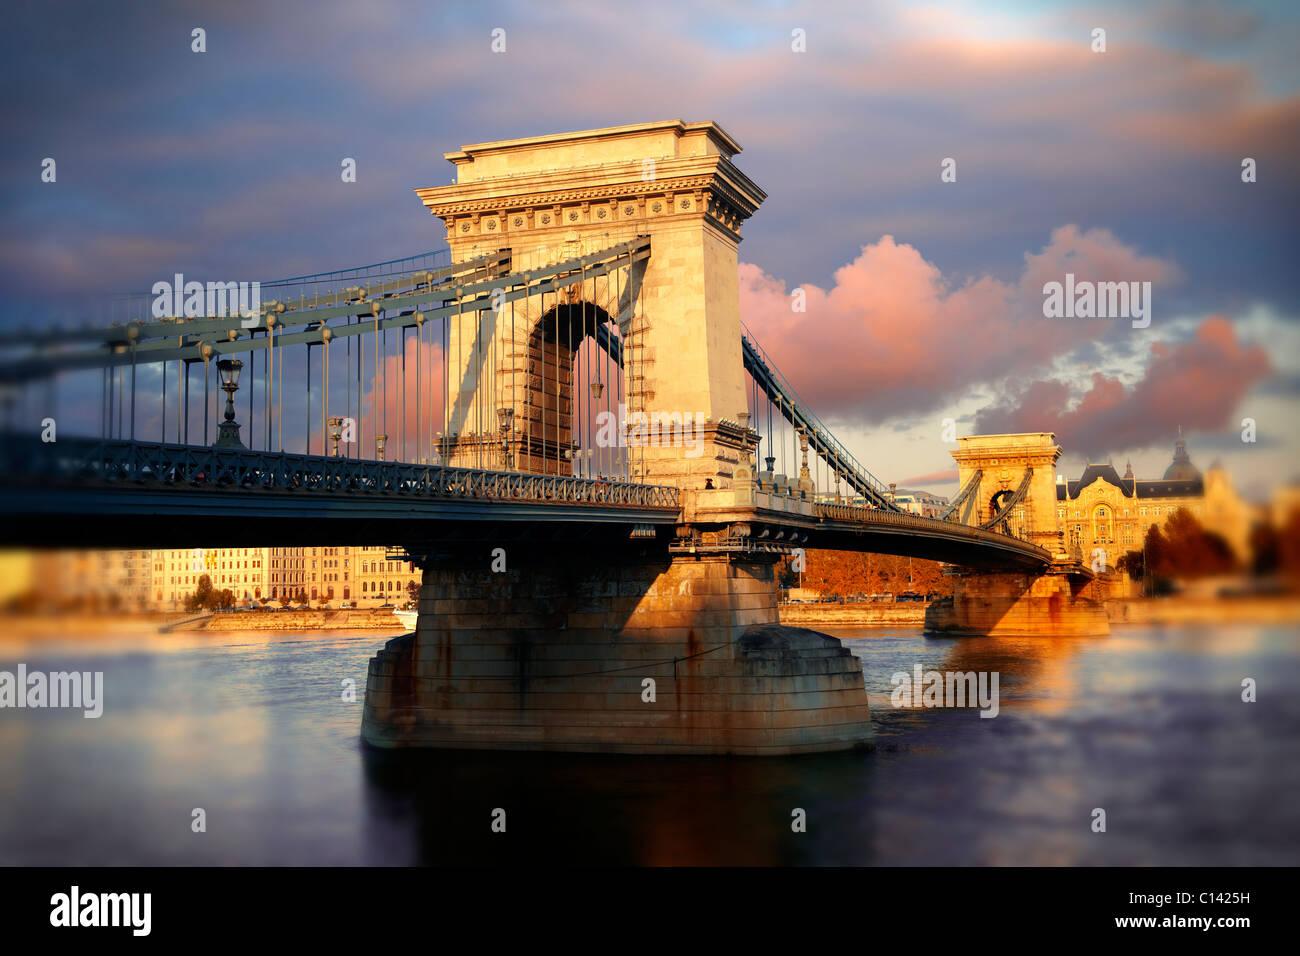 Szecheni Lanchid ( Chain Bridge ). Suspension bridge over the Danube between Buda & Pest. Budapest Hungary - Stock Image